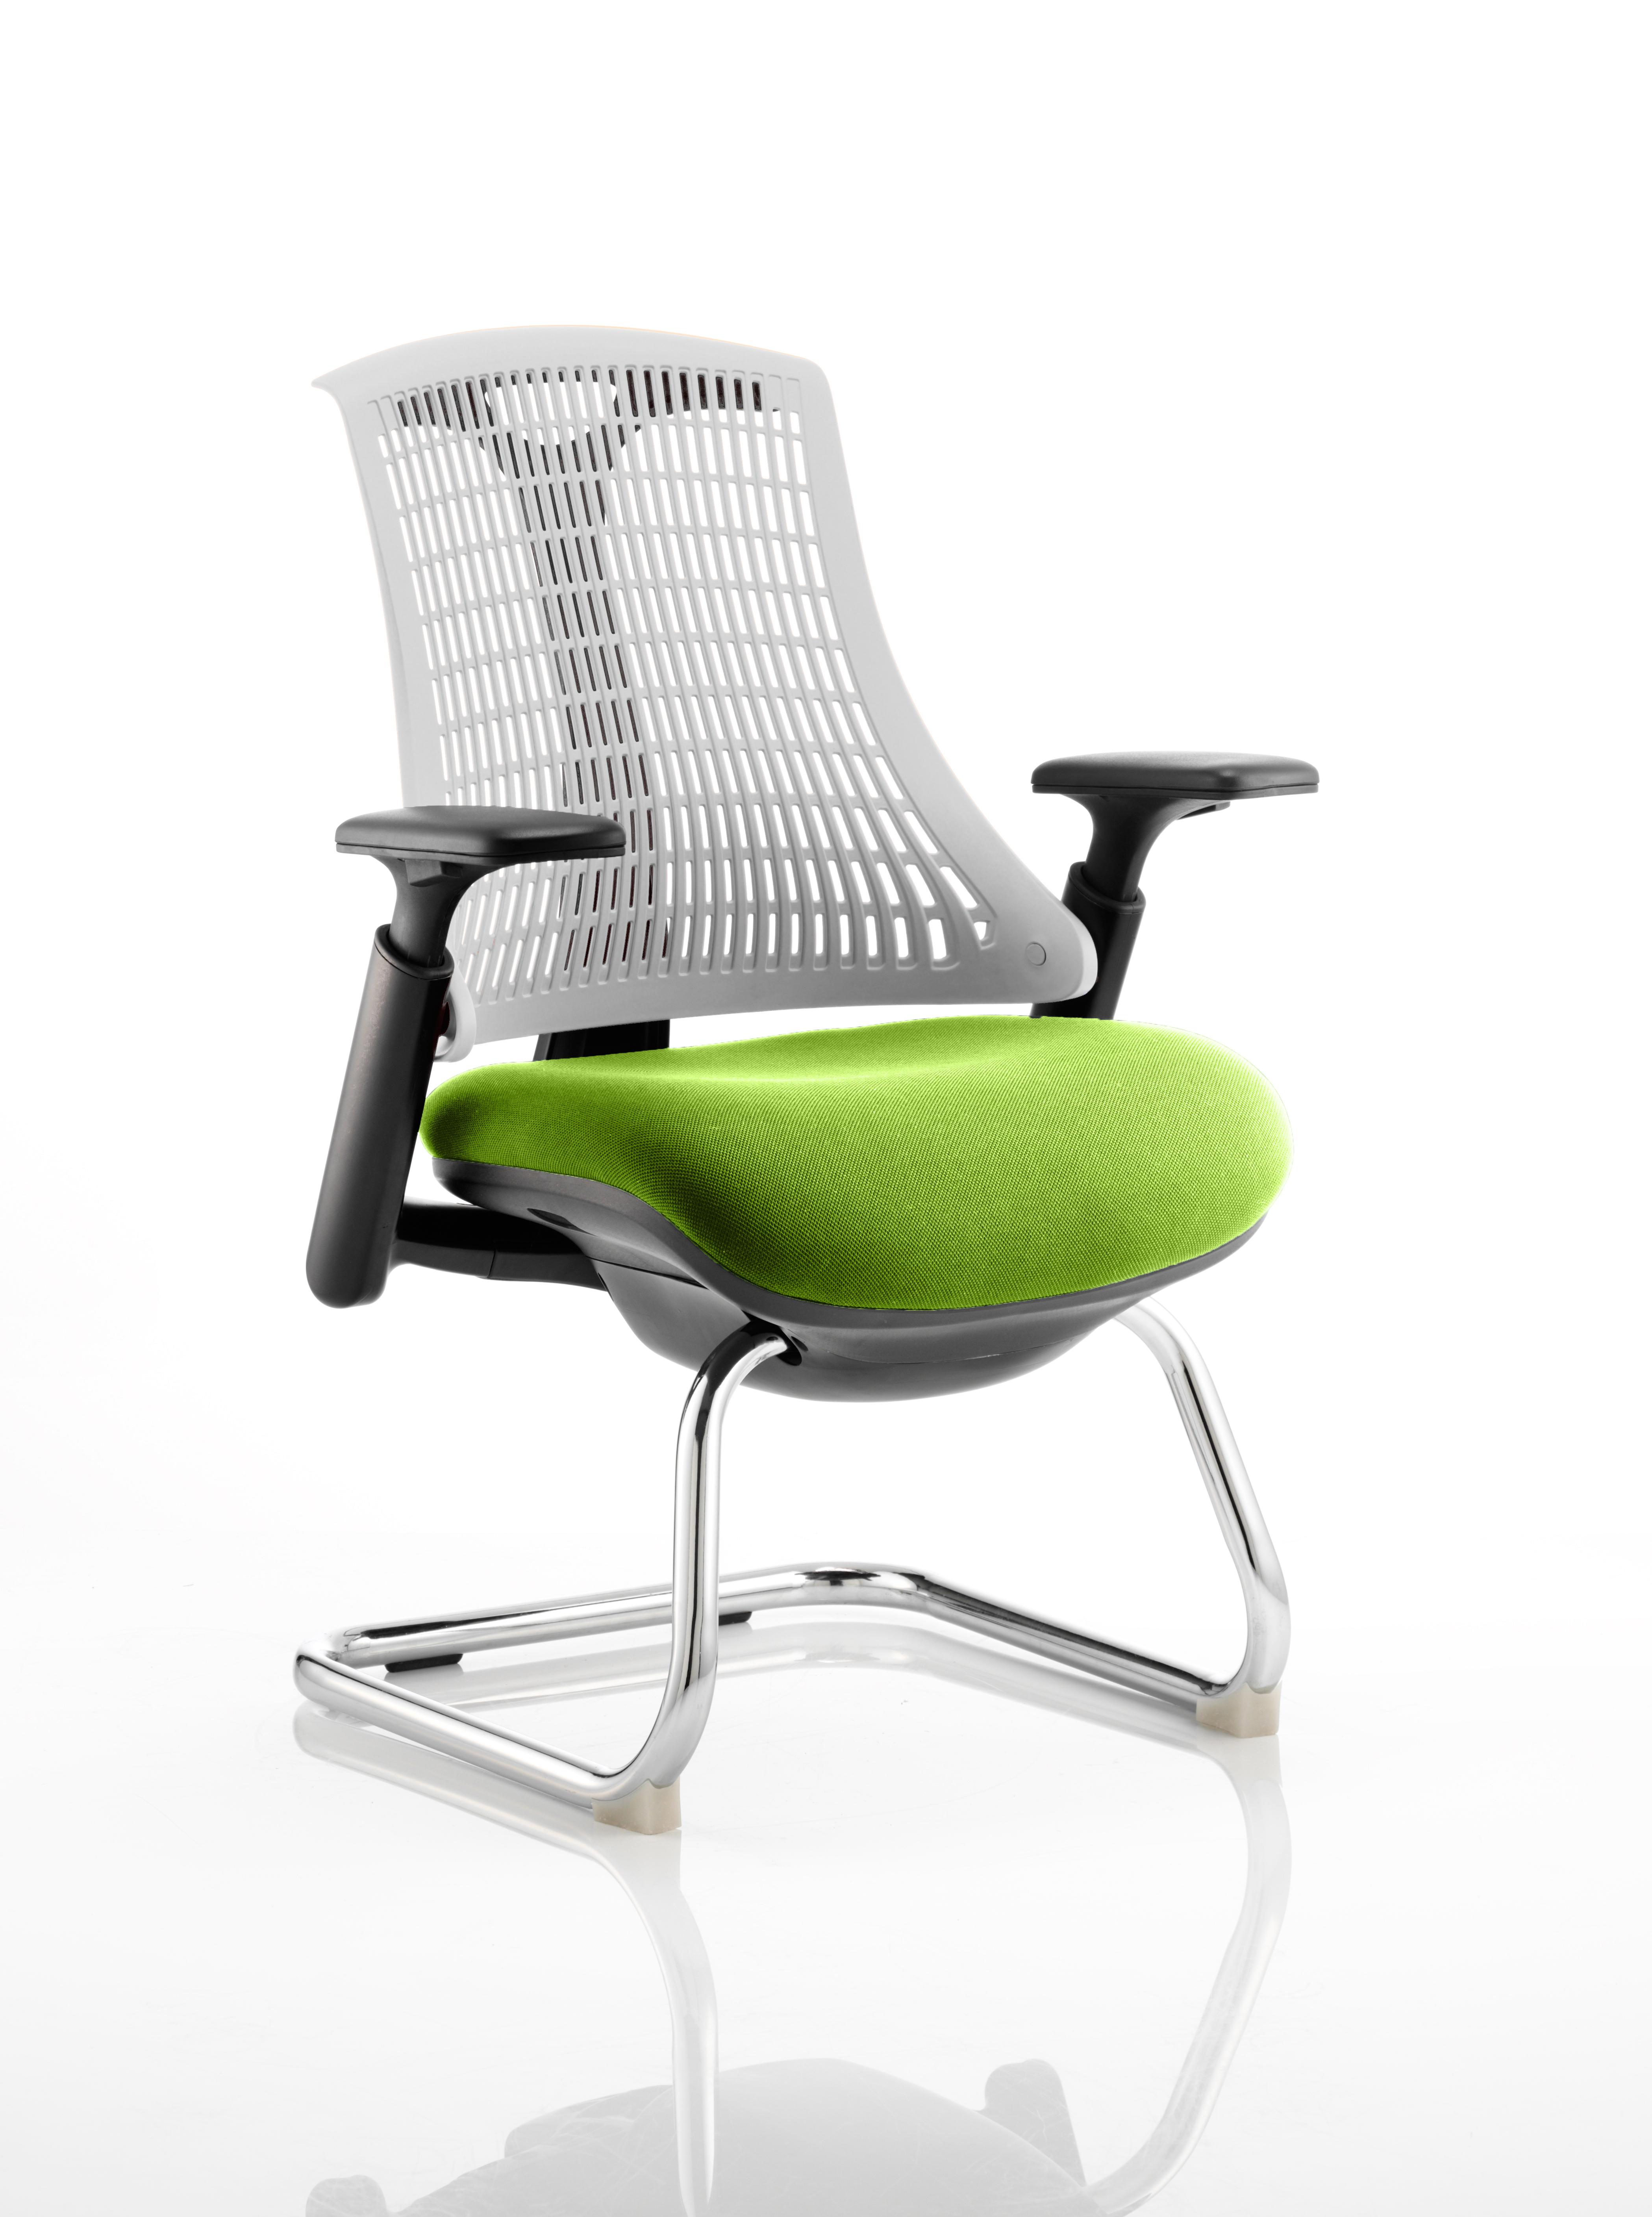 Flex Cantilever Chair Black Frame White Back Bespoke Colour Seat Myrrh Green